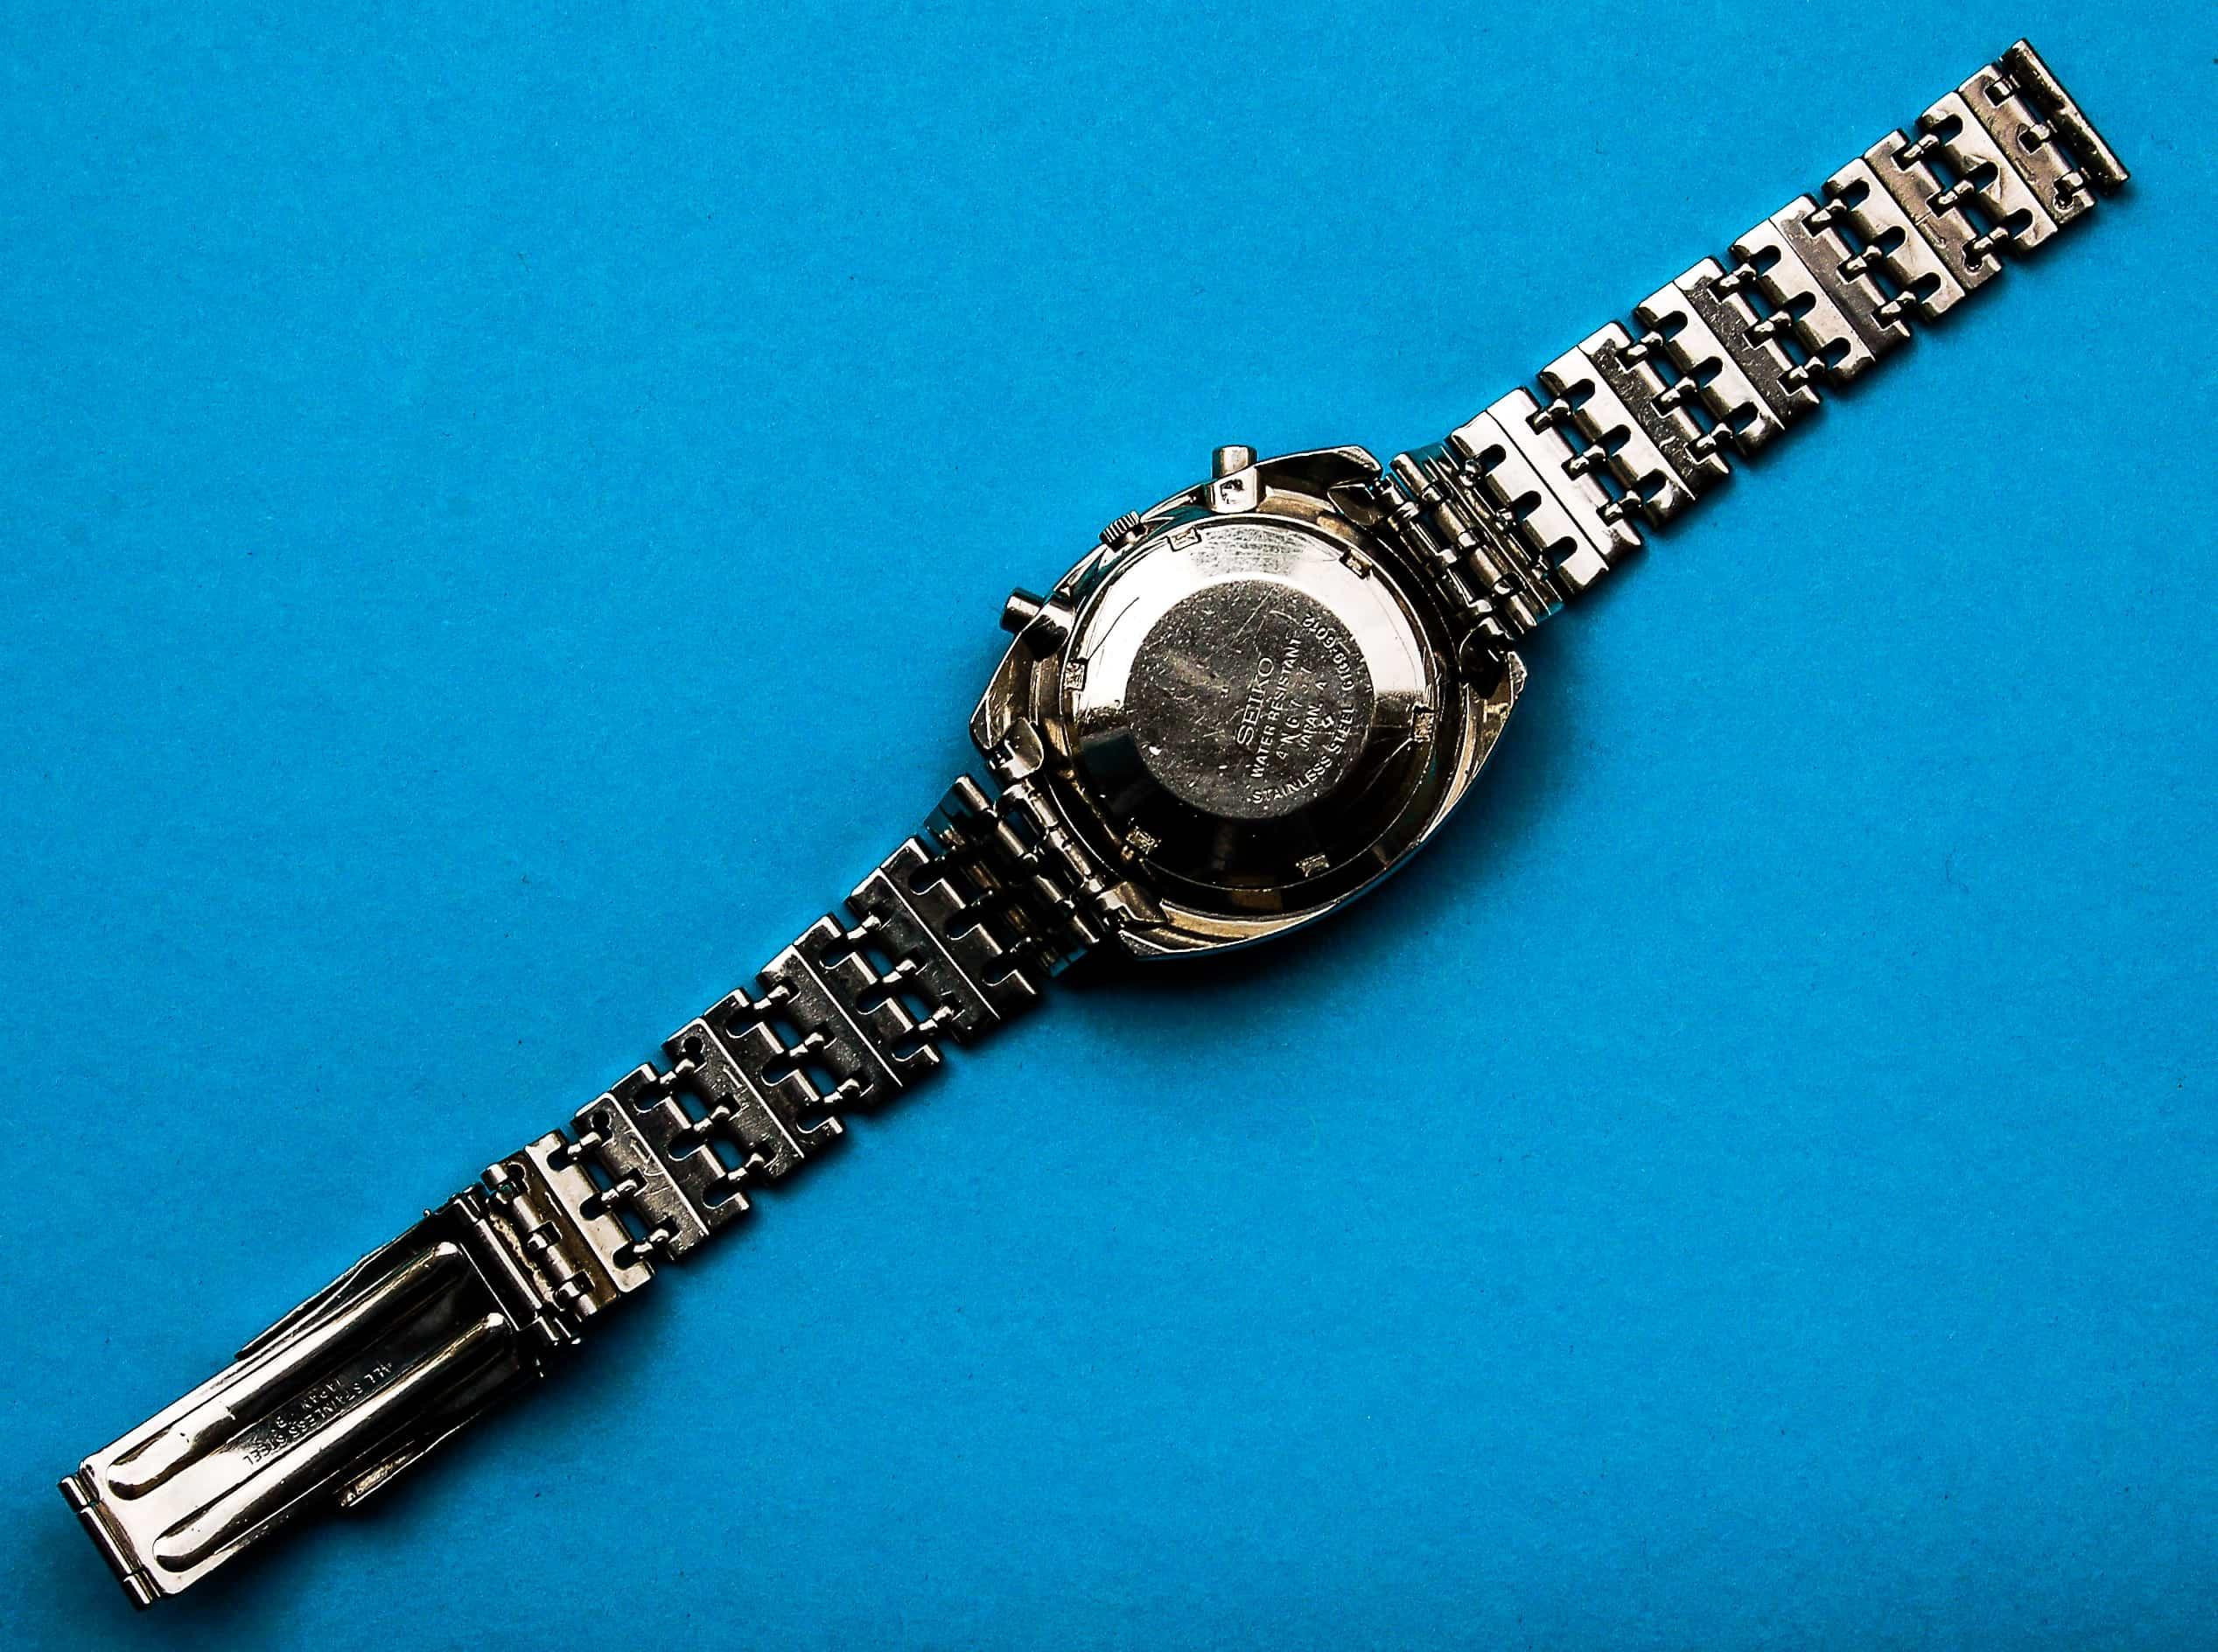 seiko chronograph 6139 6012 on an original bracelet. Black Bedroom Furniture Sets. Home Design Ideas